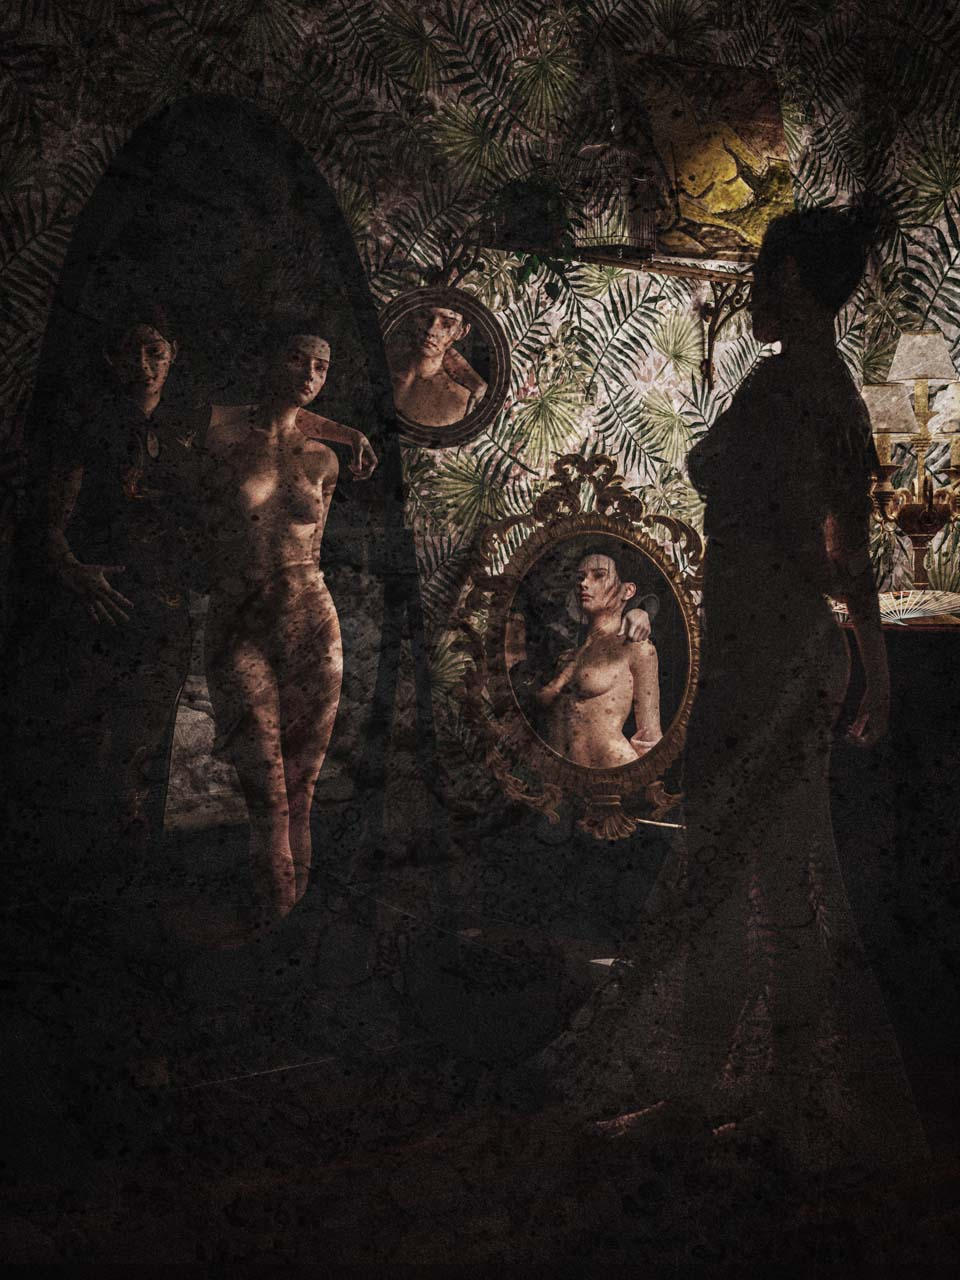 Felina Schrödinger, Selbstportrait, Autochrome, undatiert. Courtesy Collection Claire Castelle.